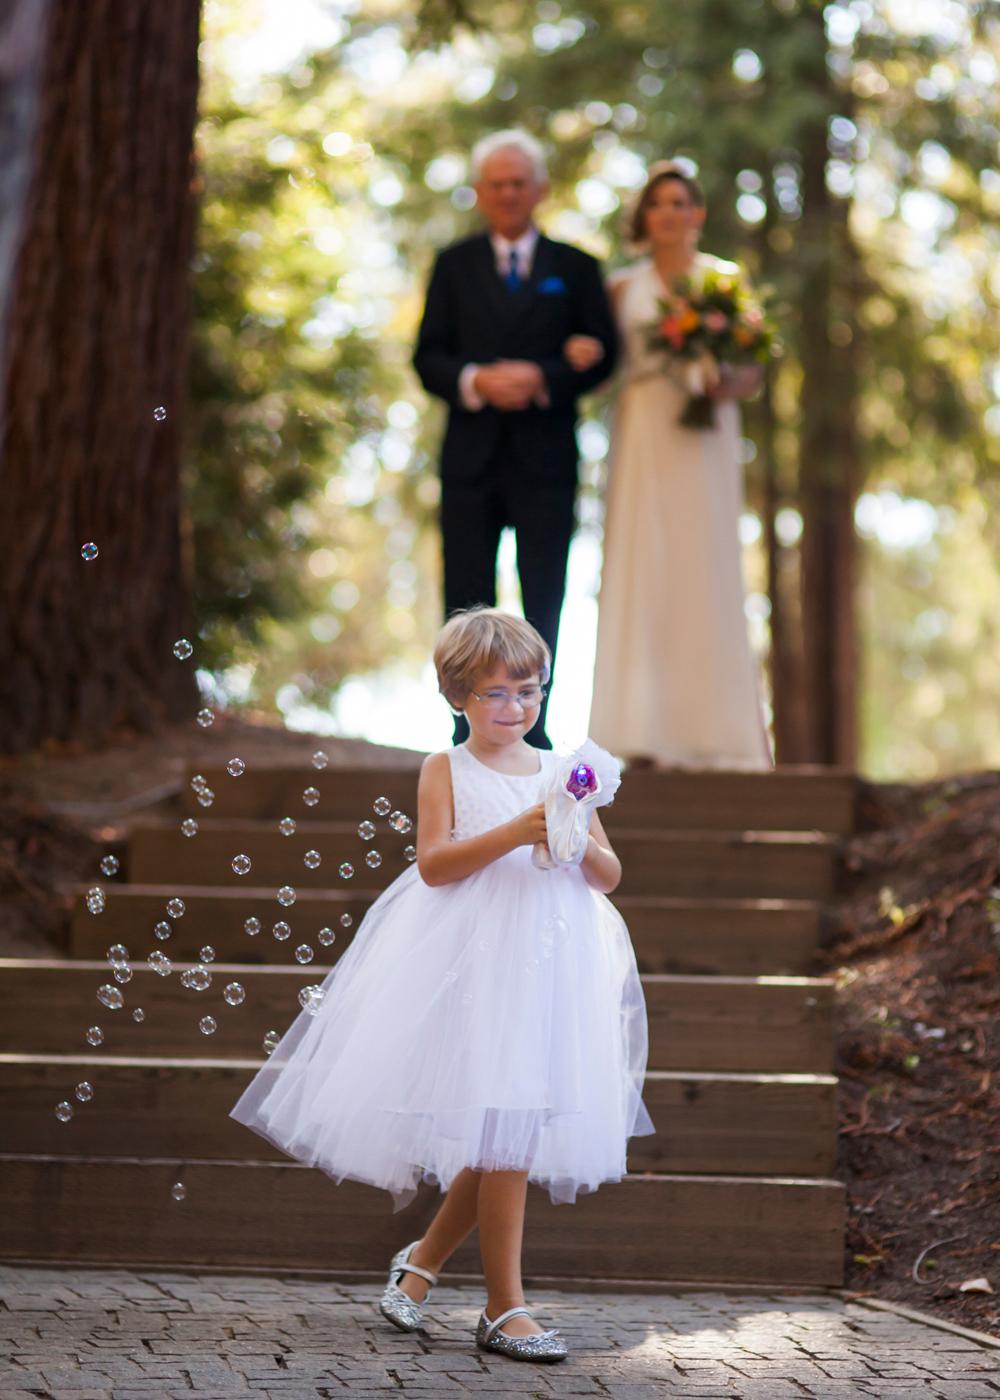 pema-osel-ling-santa-cruz-wedding-photography-lilouette-35.jpg